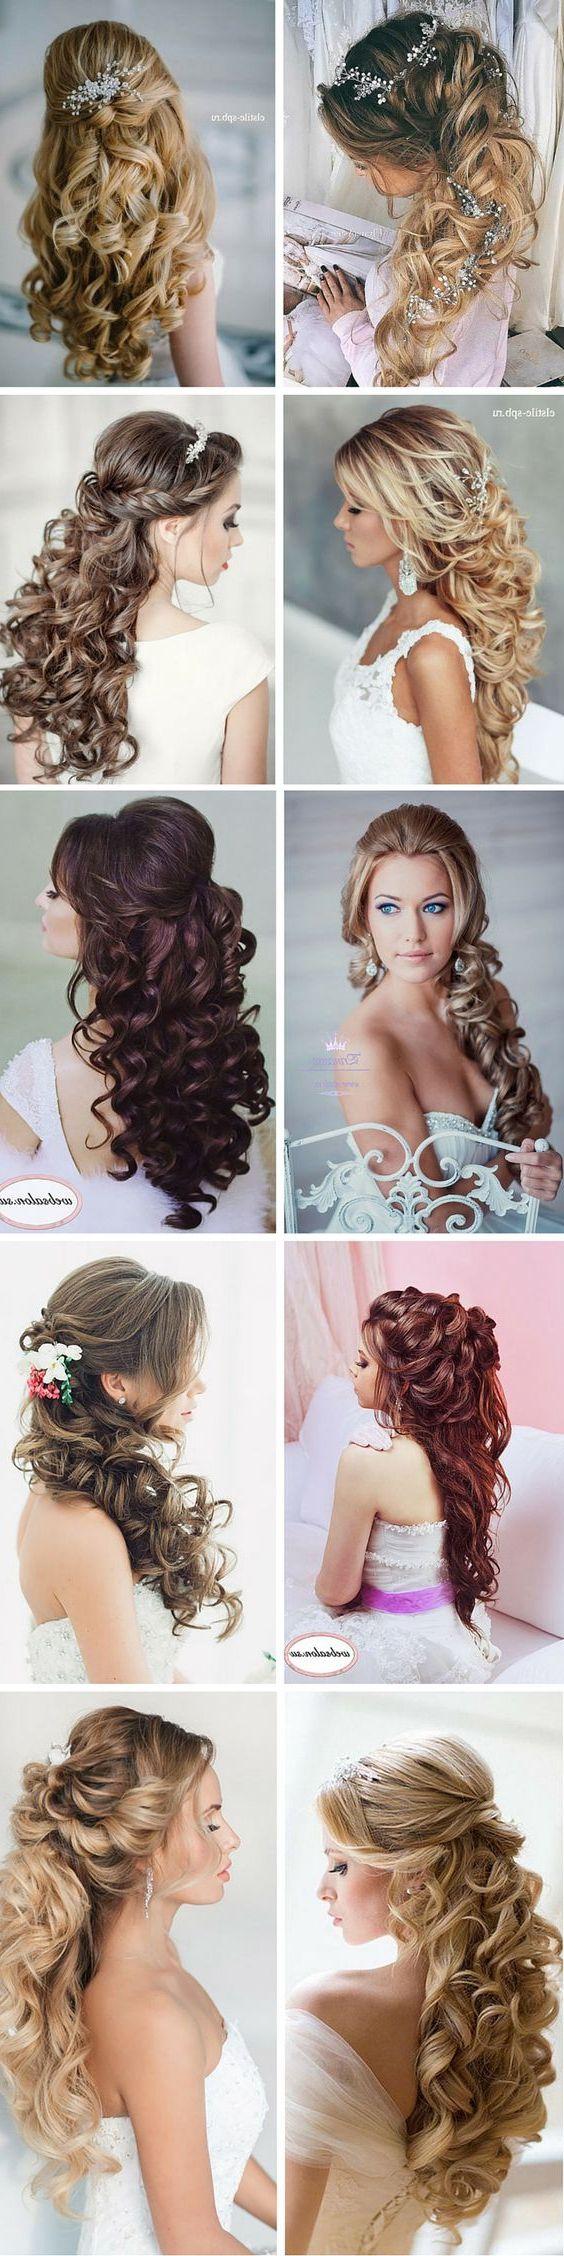 100 Romantic Long Wedding Hairstyles 2021 Curls Half Up Boho Wedding Hairstyles For Long Hair Elegant Wedding Hair Long Hair Styles